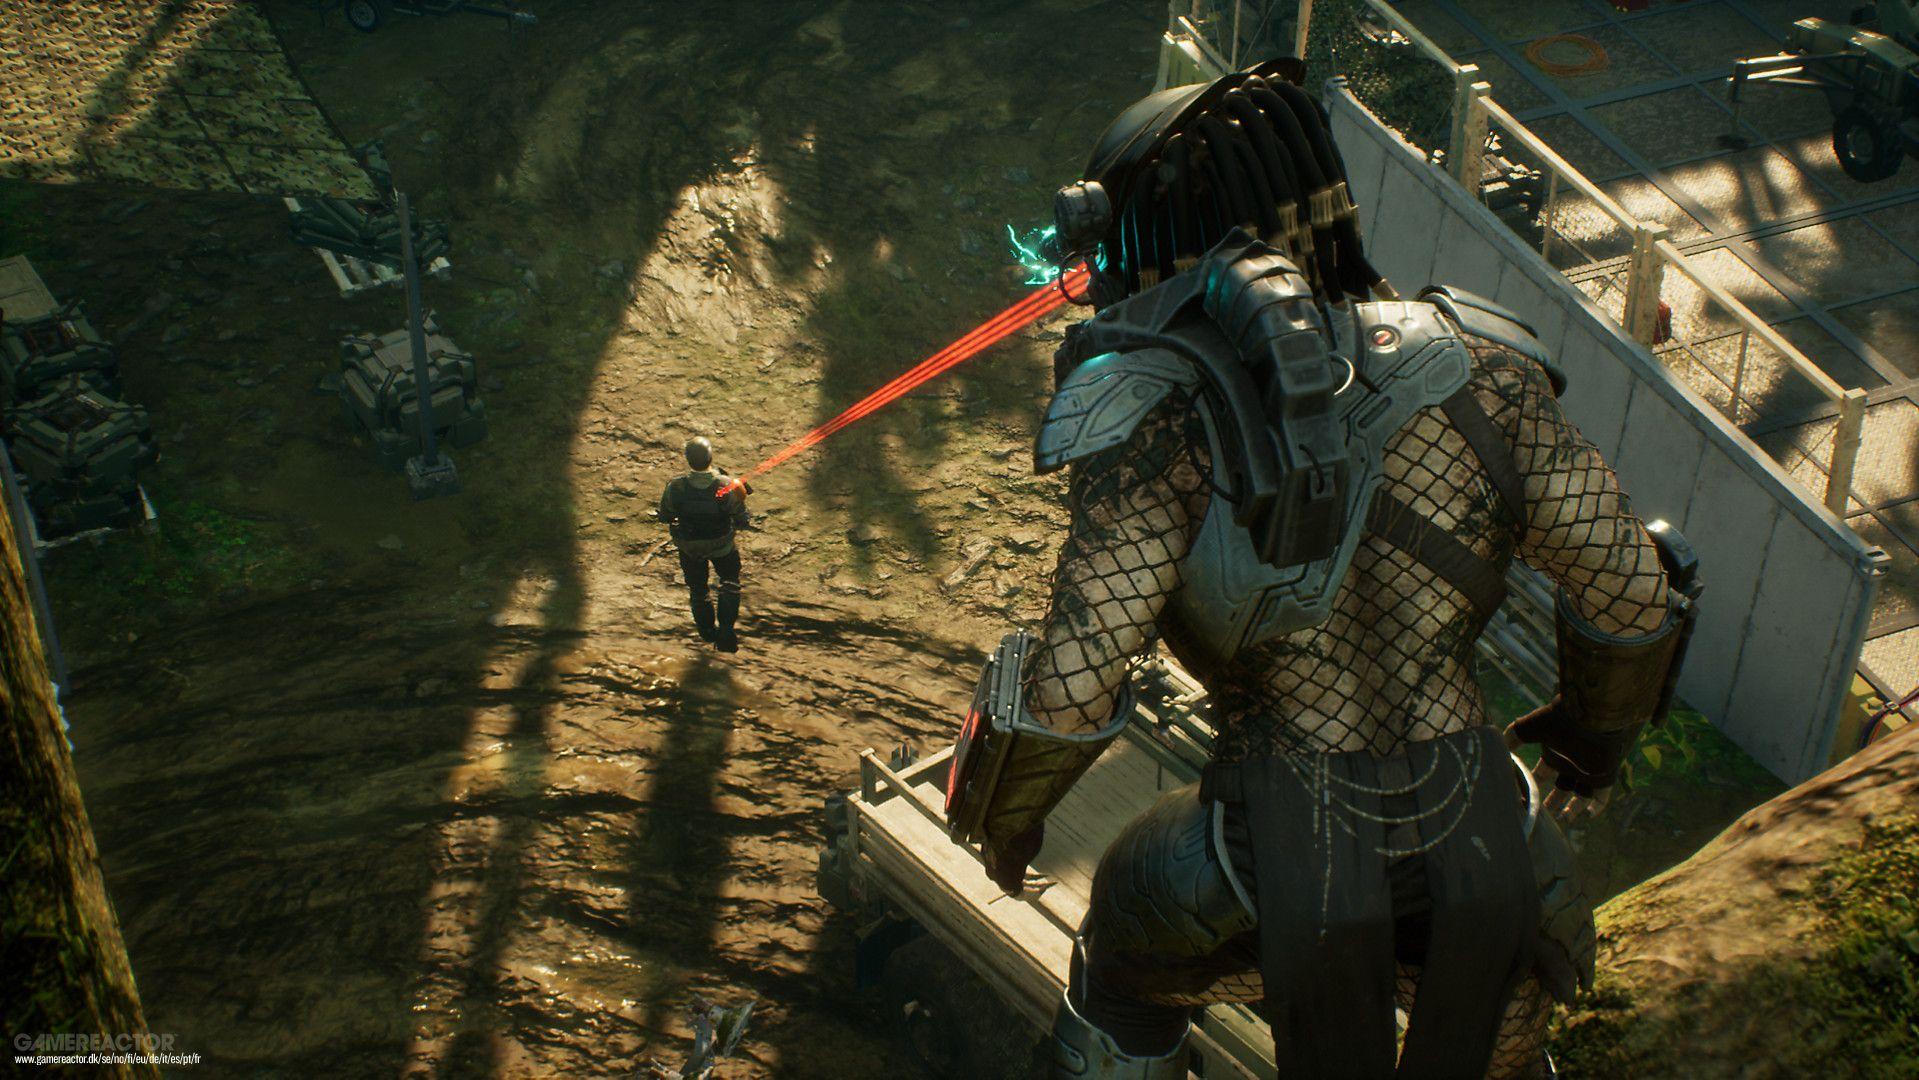 Preview: Probamos el videojuego de Depredador: Hunting Grounds